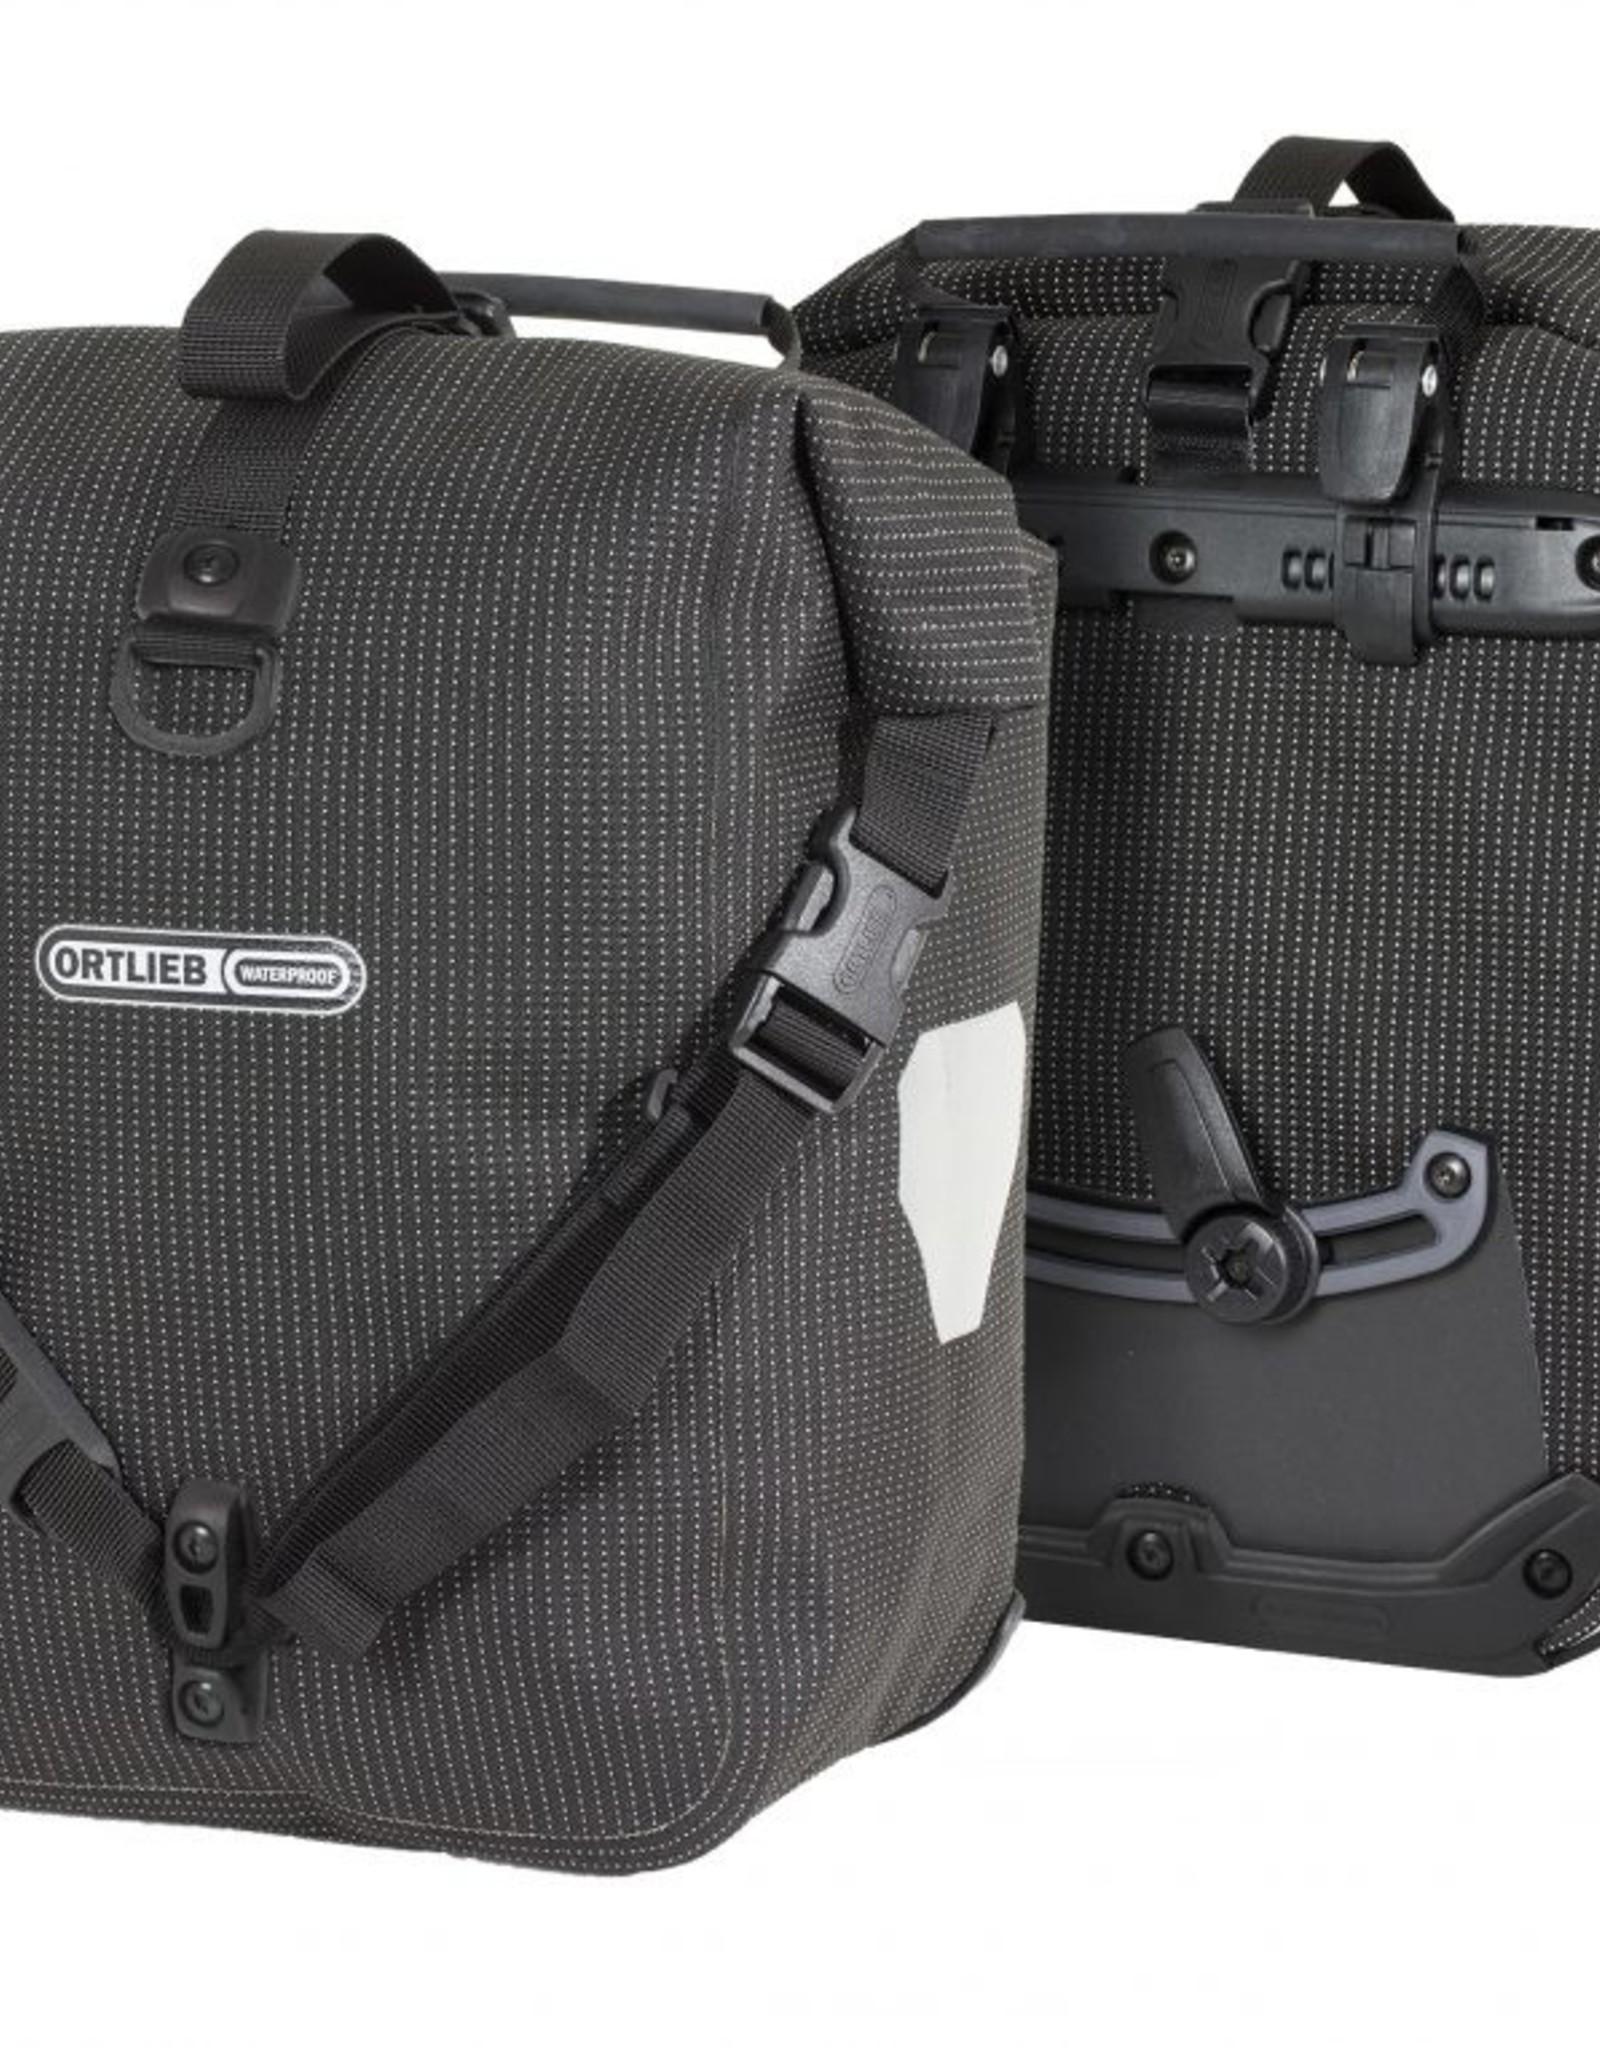 Ortlieb Ortlieb Sport-Roller High Visibility: 25 Liter, Pair, Black